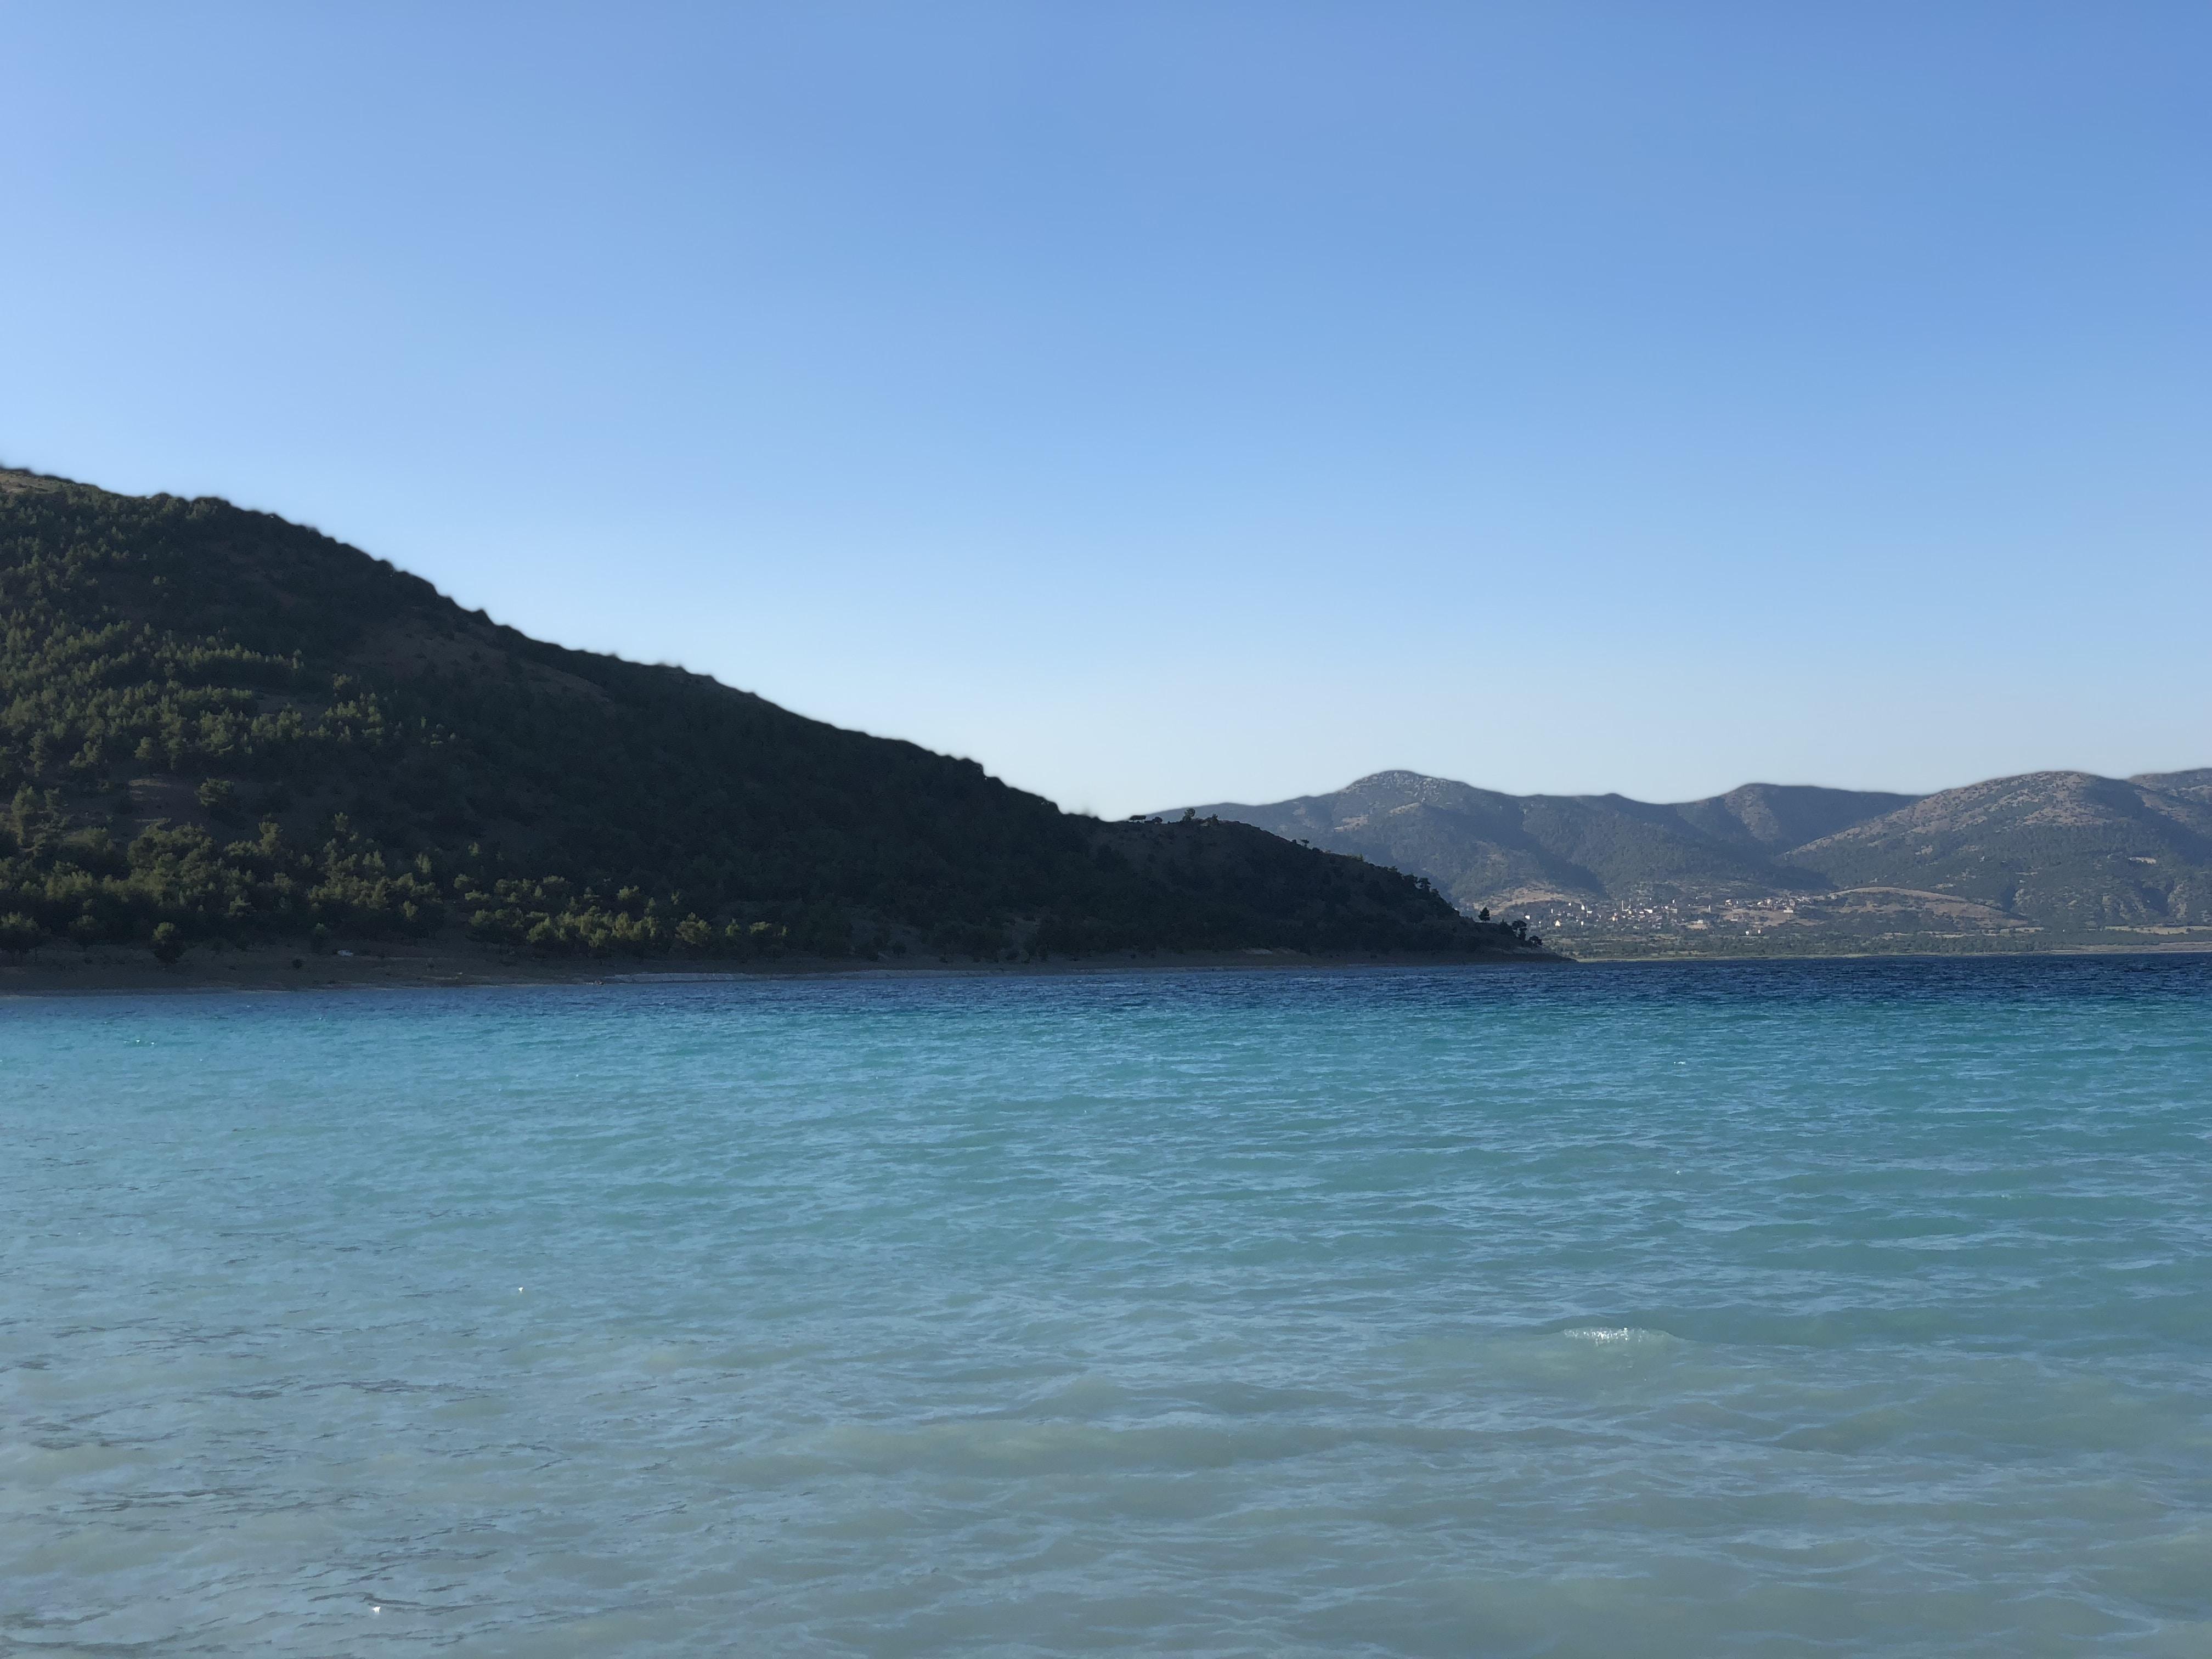 Salda Lake Turkeys Eminent City Of Hd Photo By Osman Daban